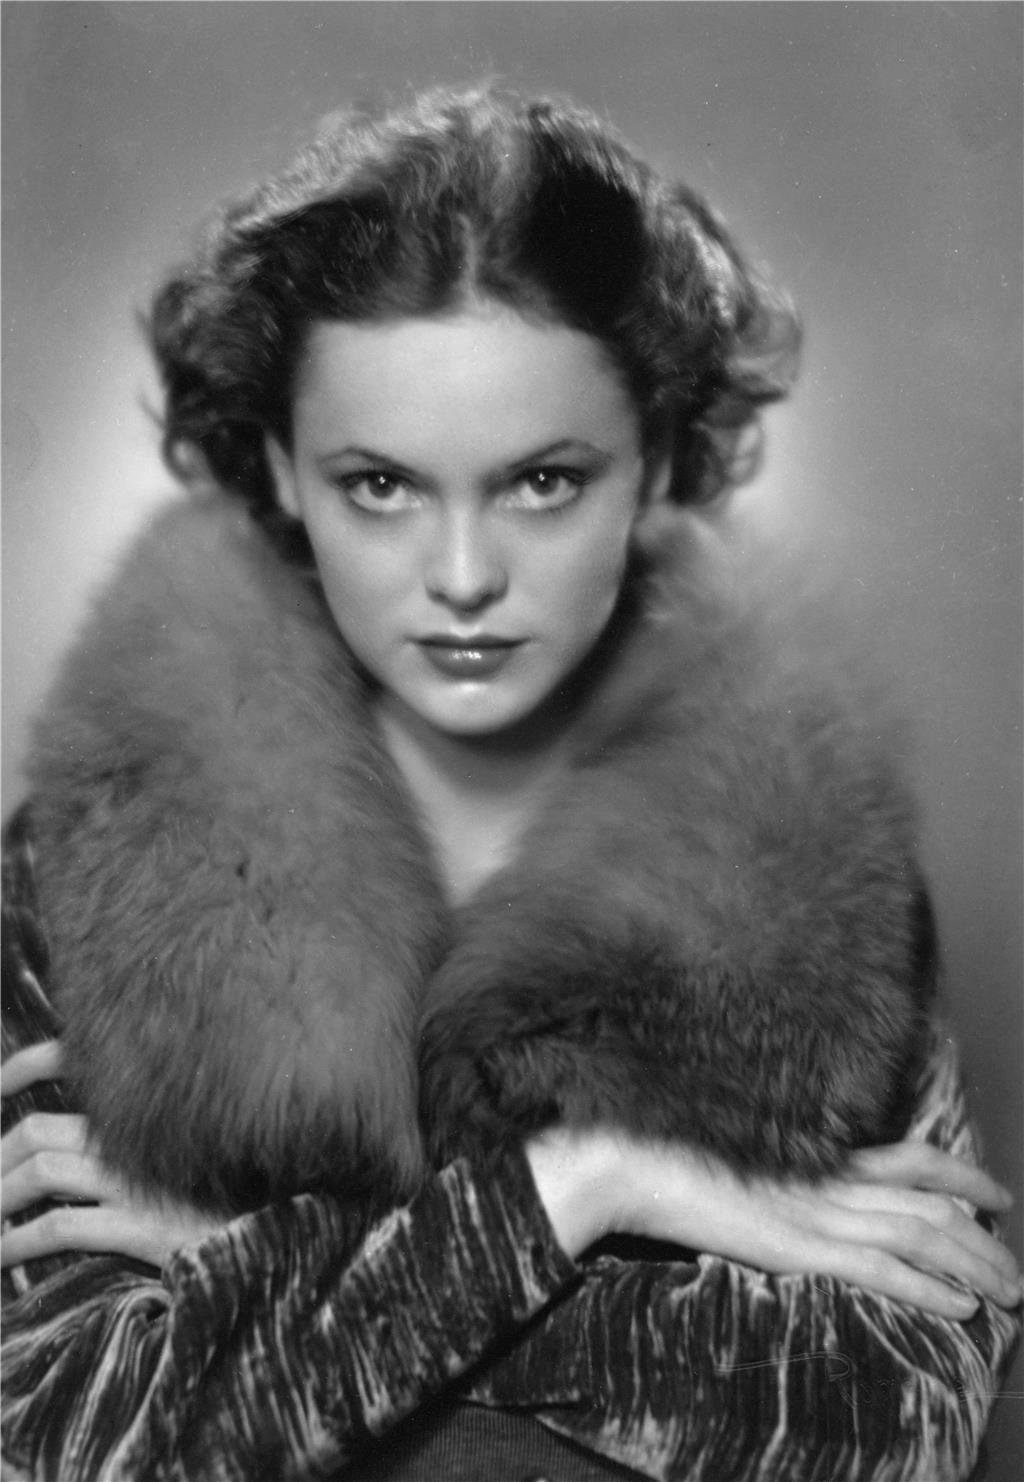 Photo of Nancy Coleman 1940s. Photo by Marjorie Duryee